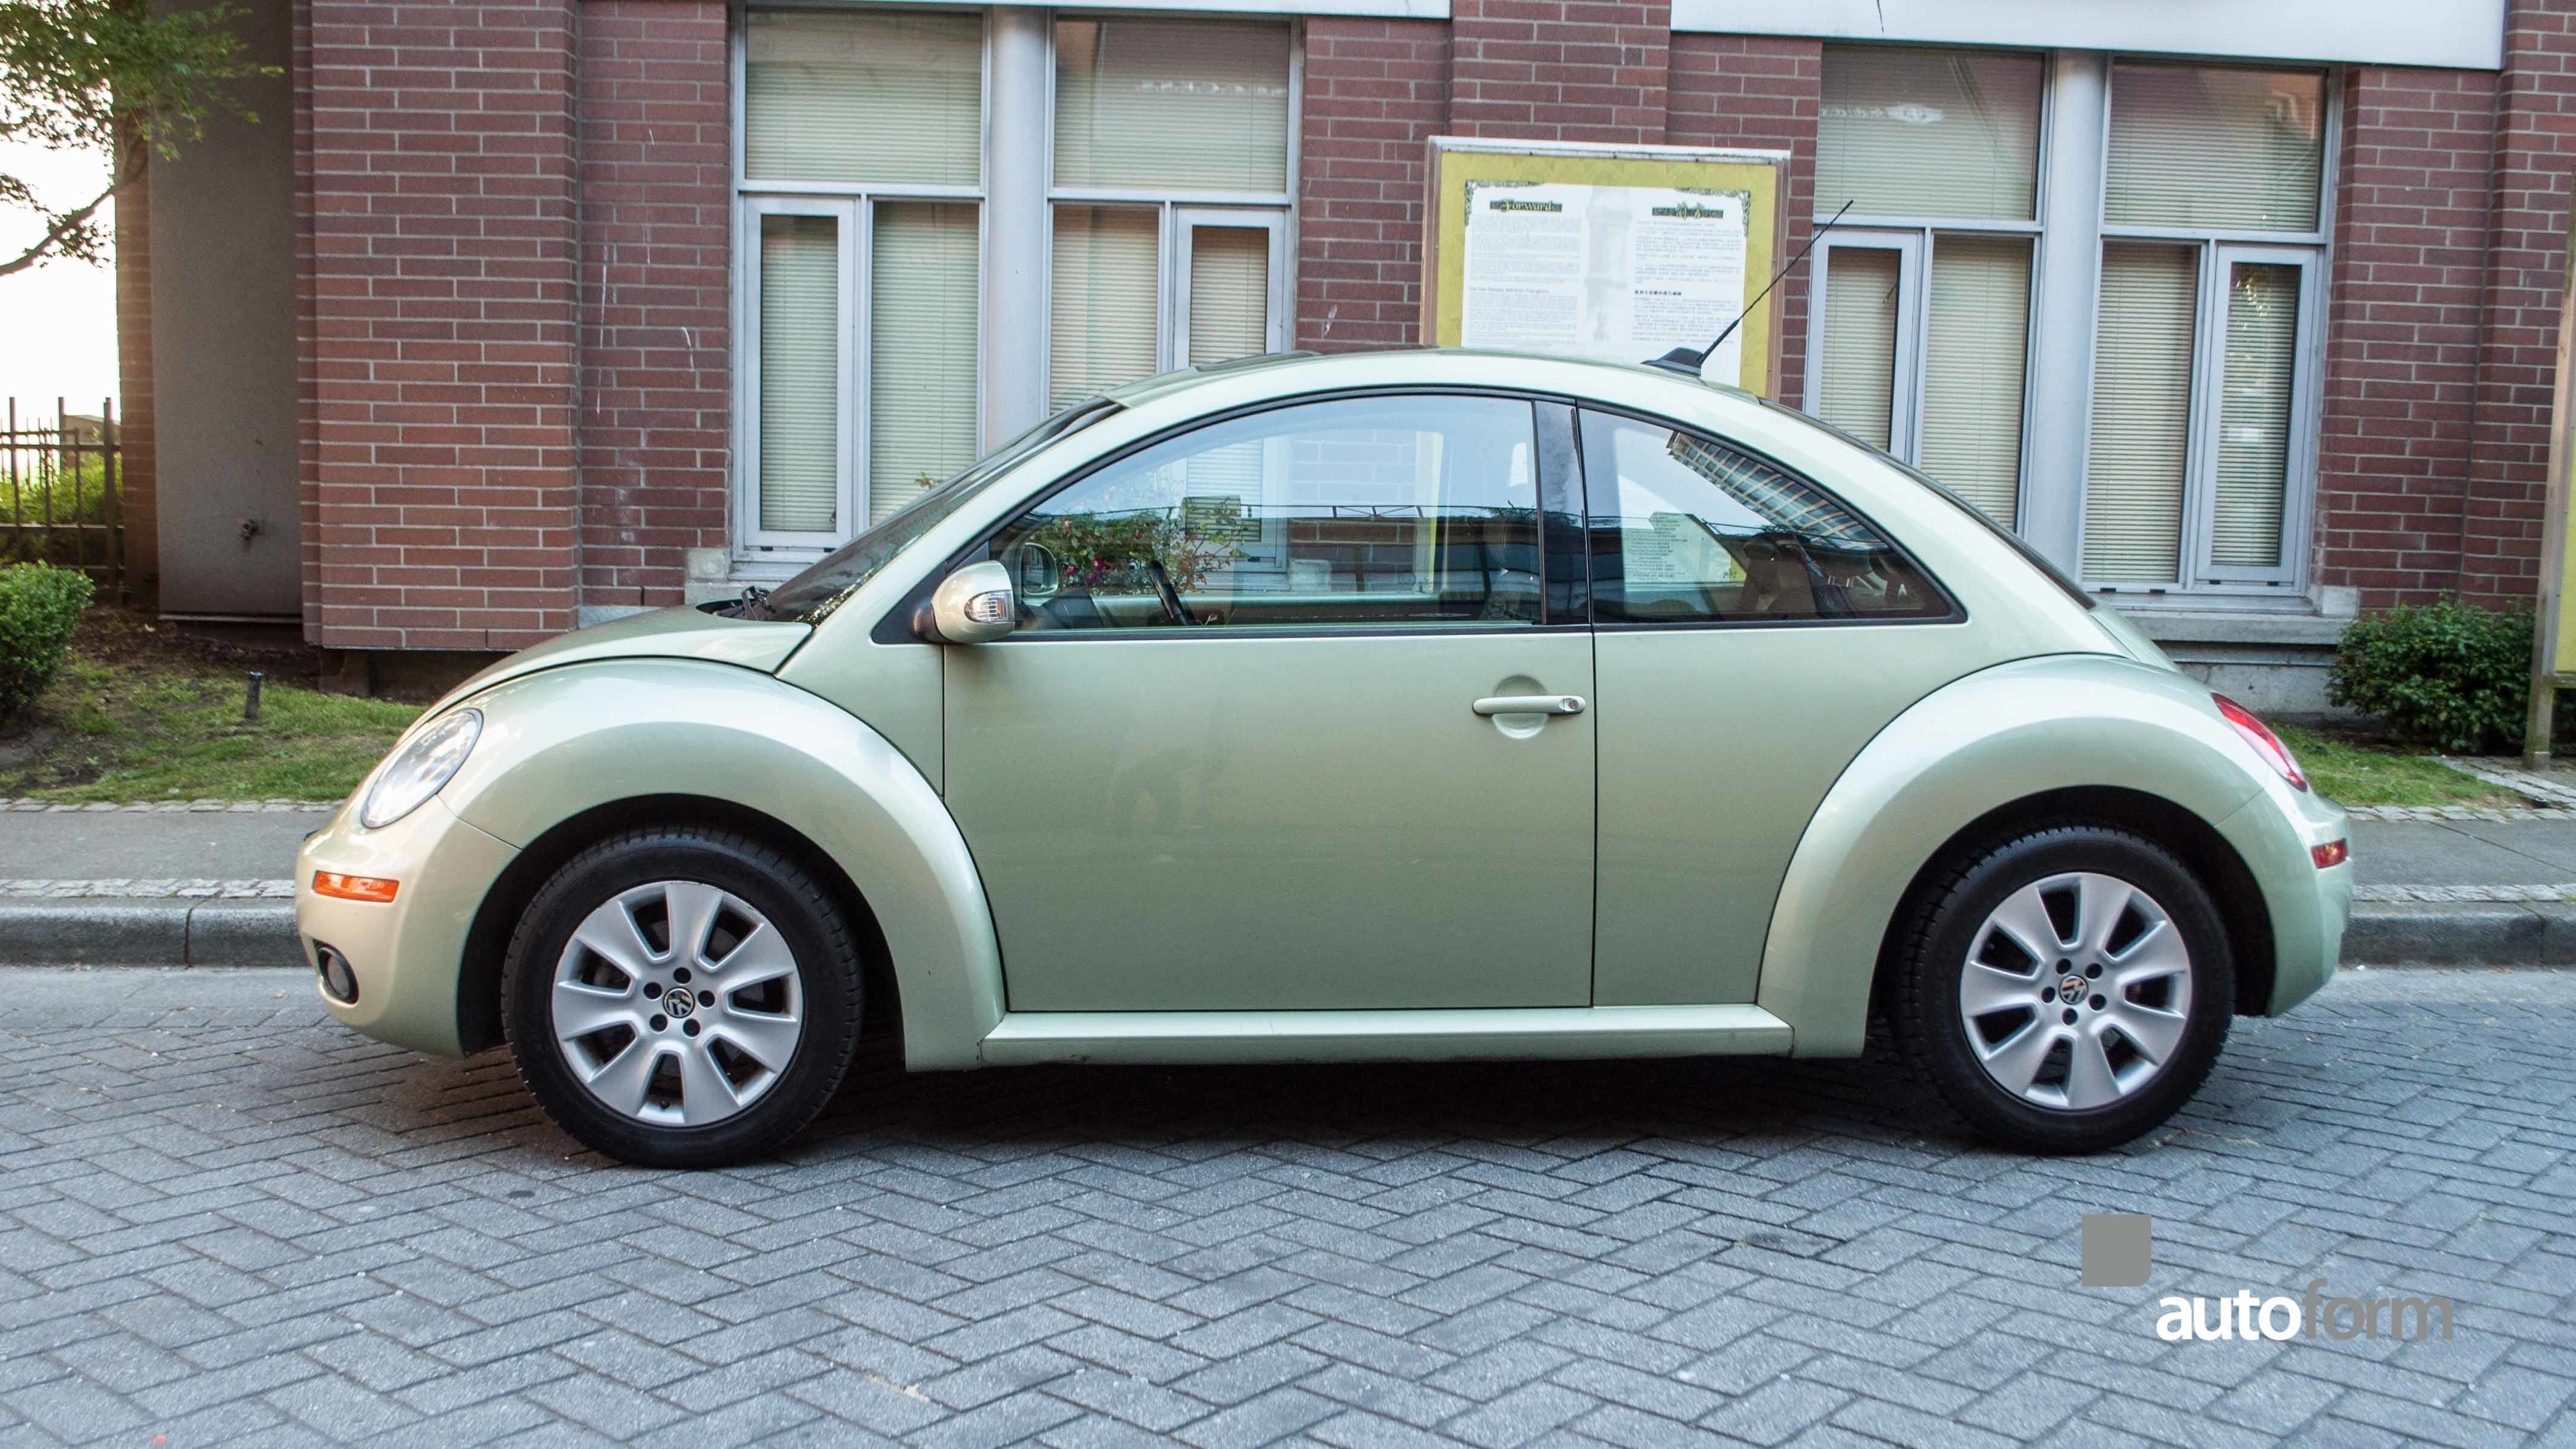 2010 volkswagen beetle autoform. Black Bedroom Furniture Sets. Home Design Ideas